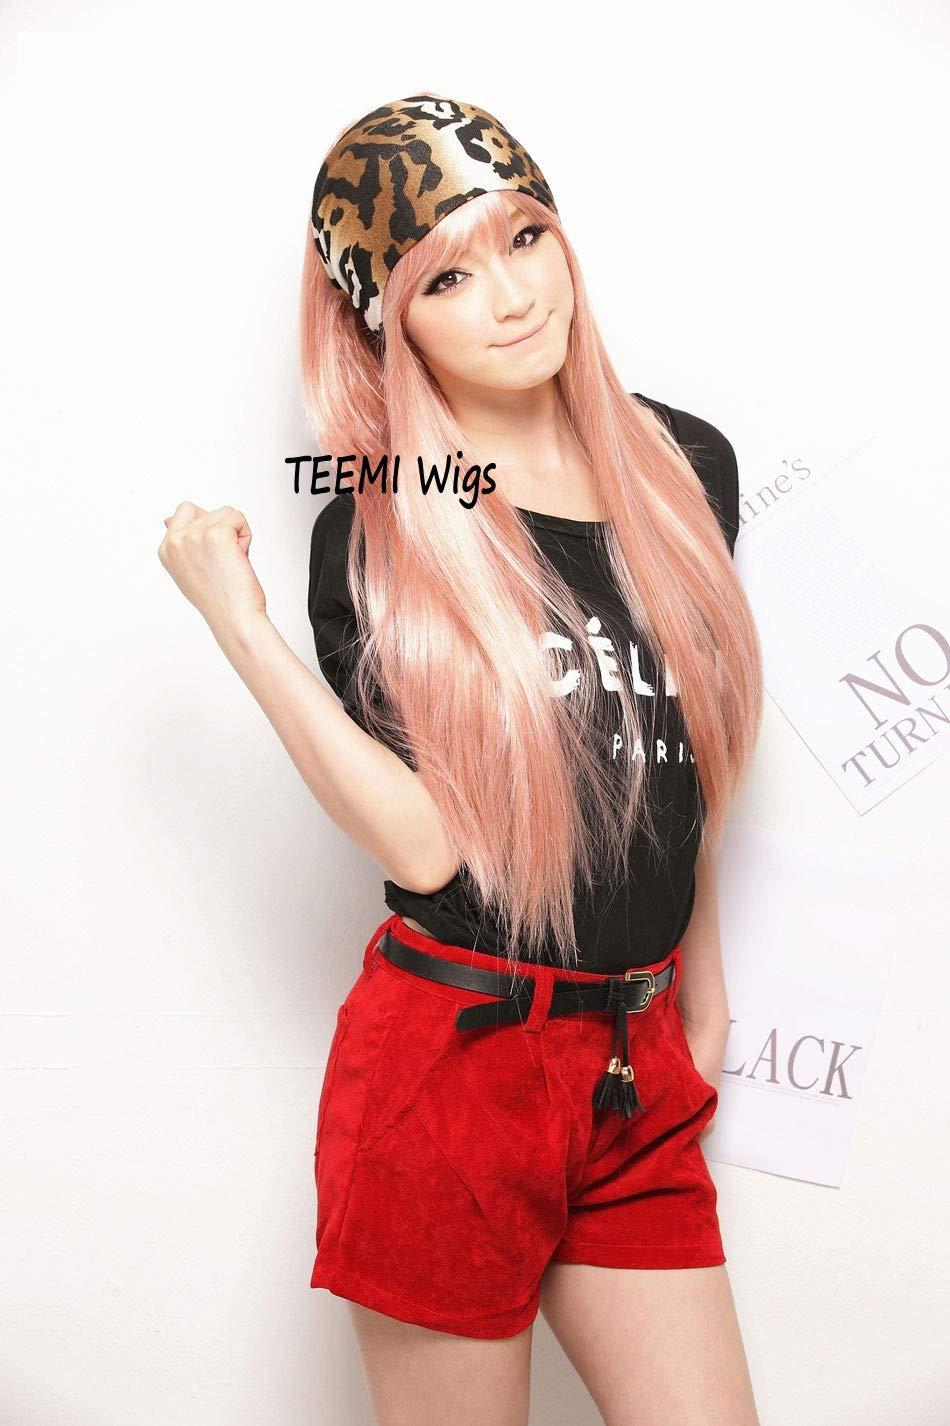 TEEMI-Long Straight Pink Wig With Bangs Hair Wigs Heat Resistance